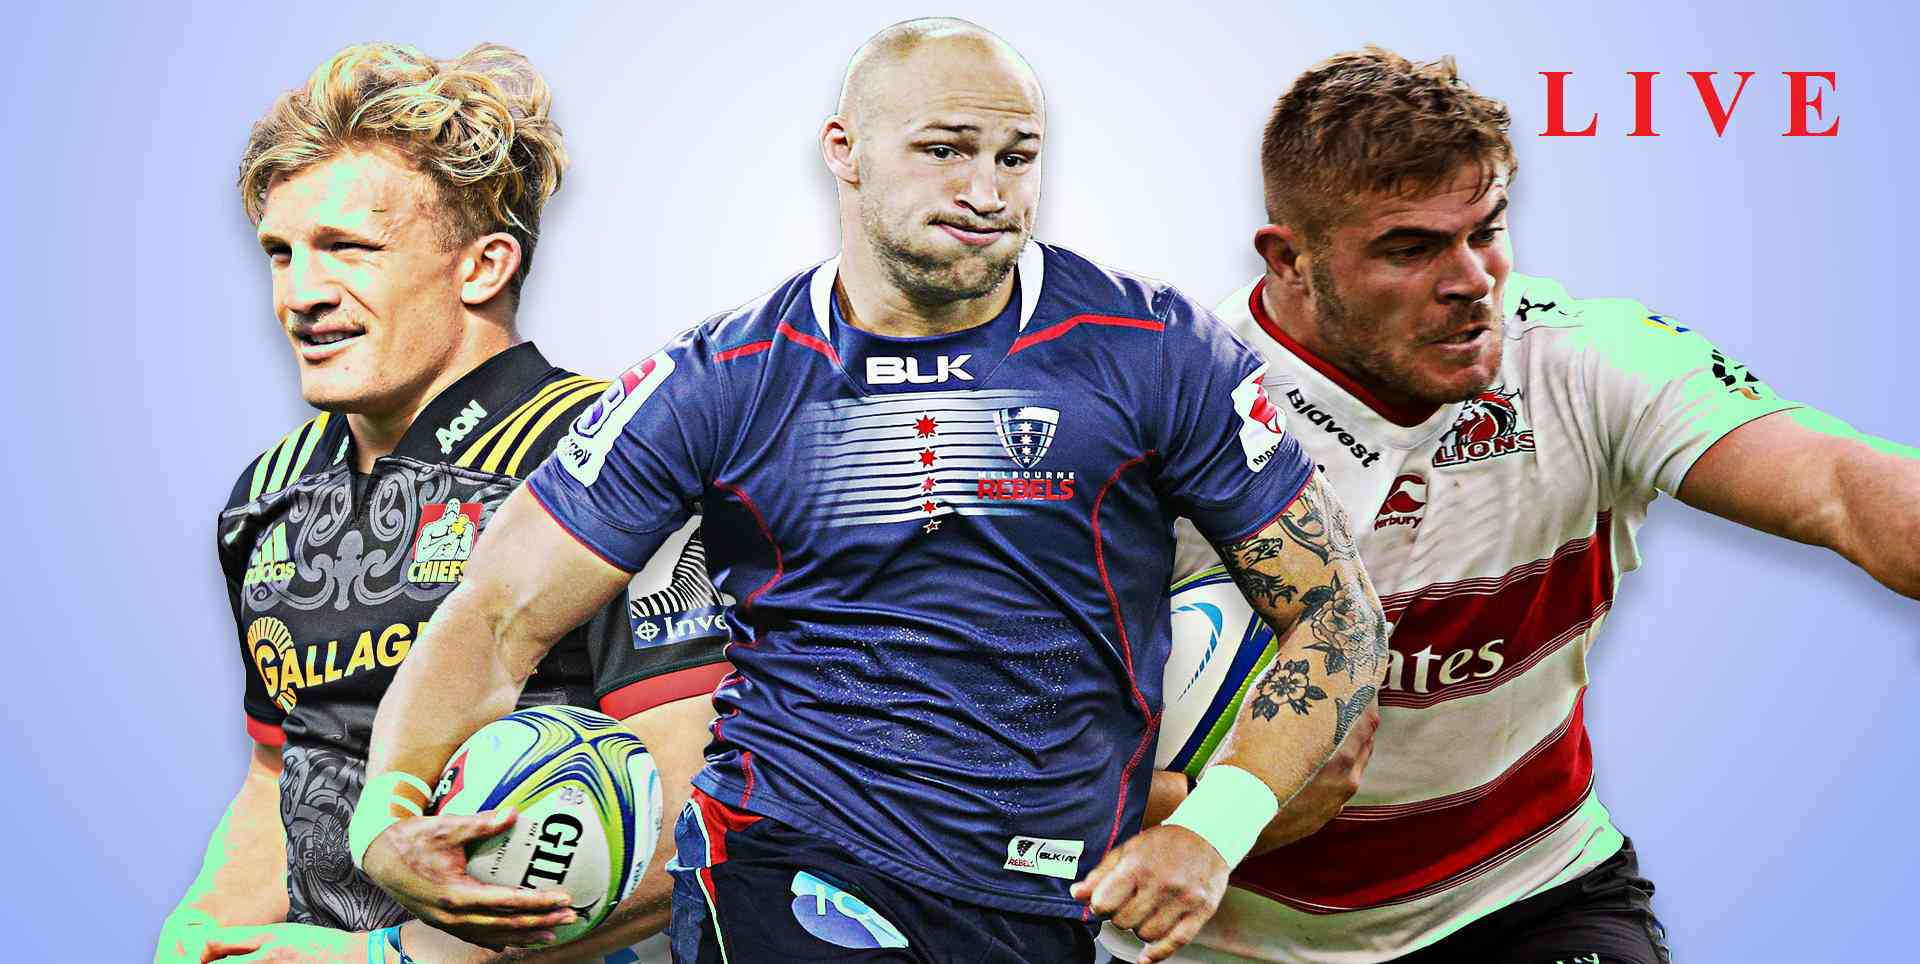 live-ulster-vs-edinburgh-rugby-online